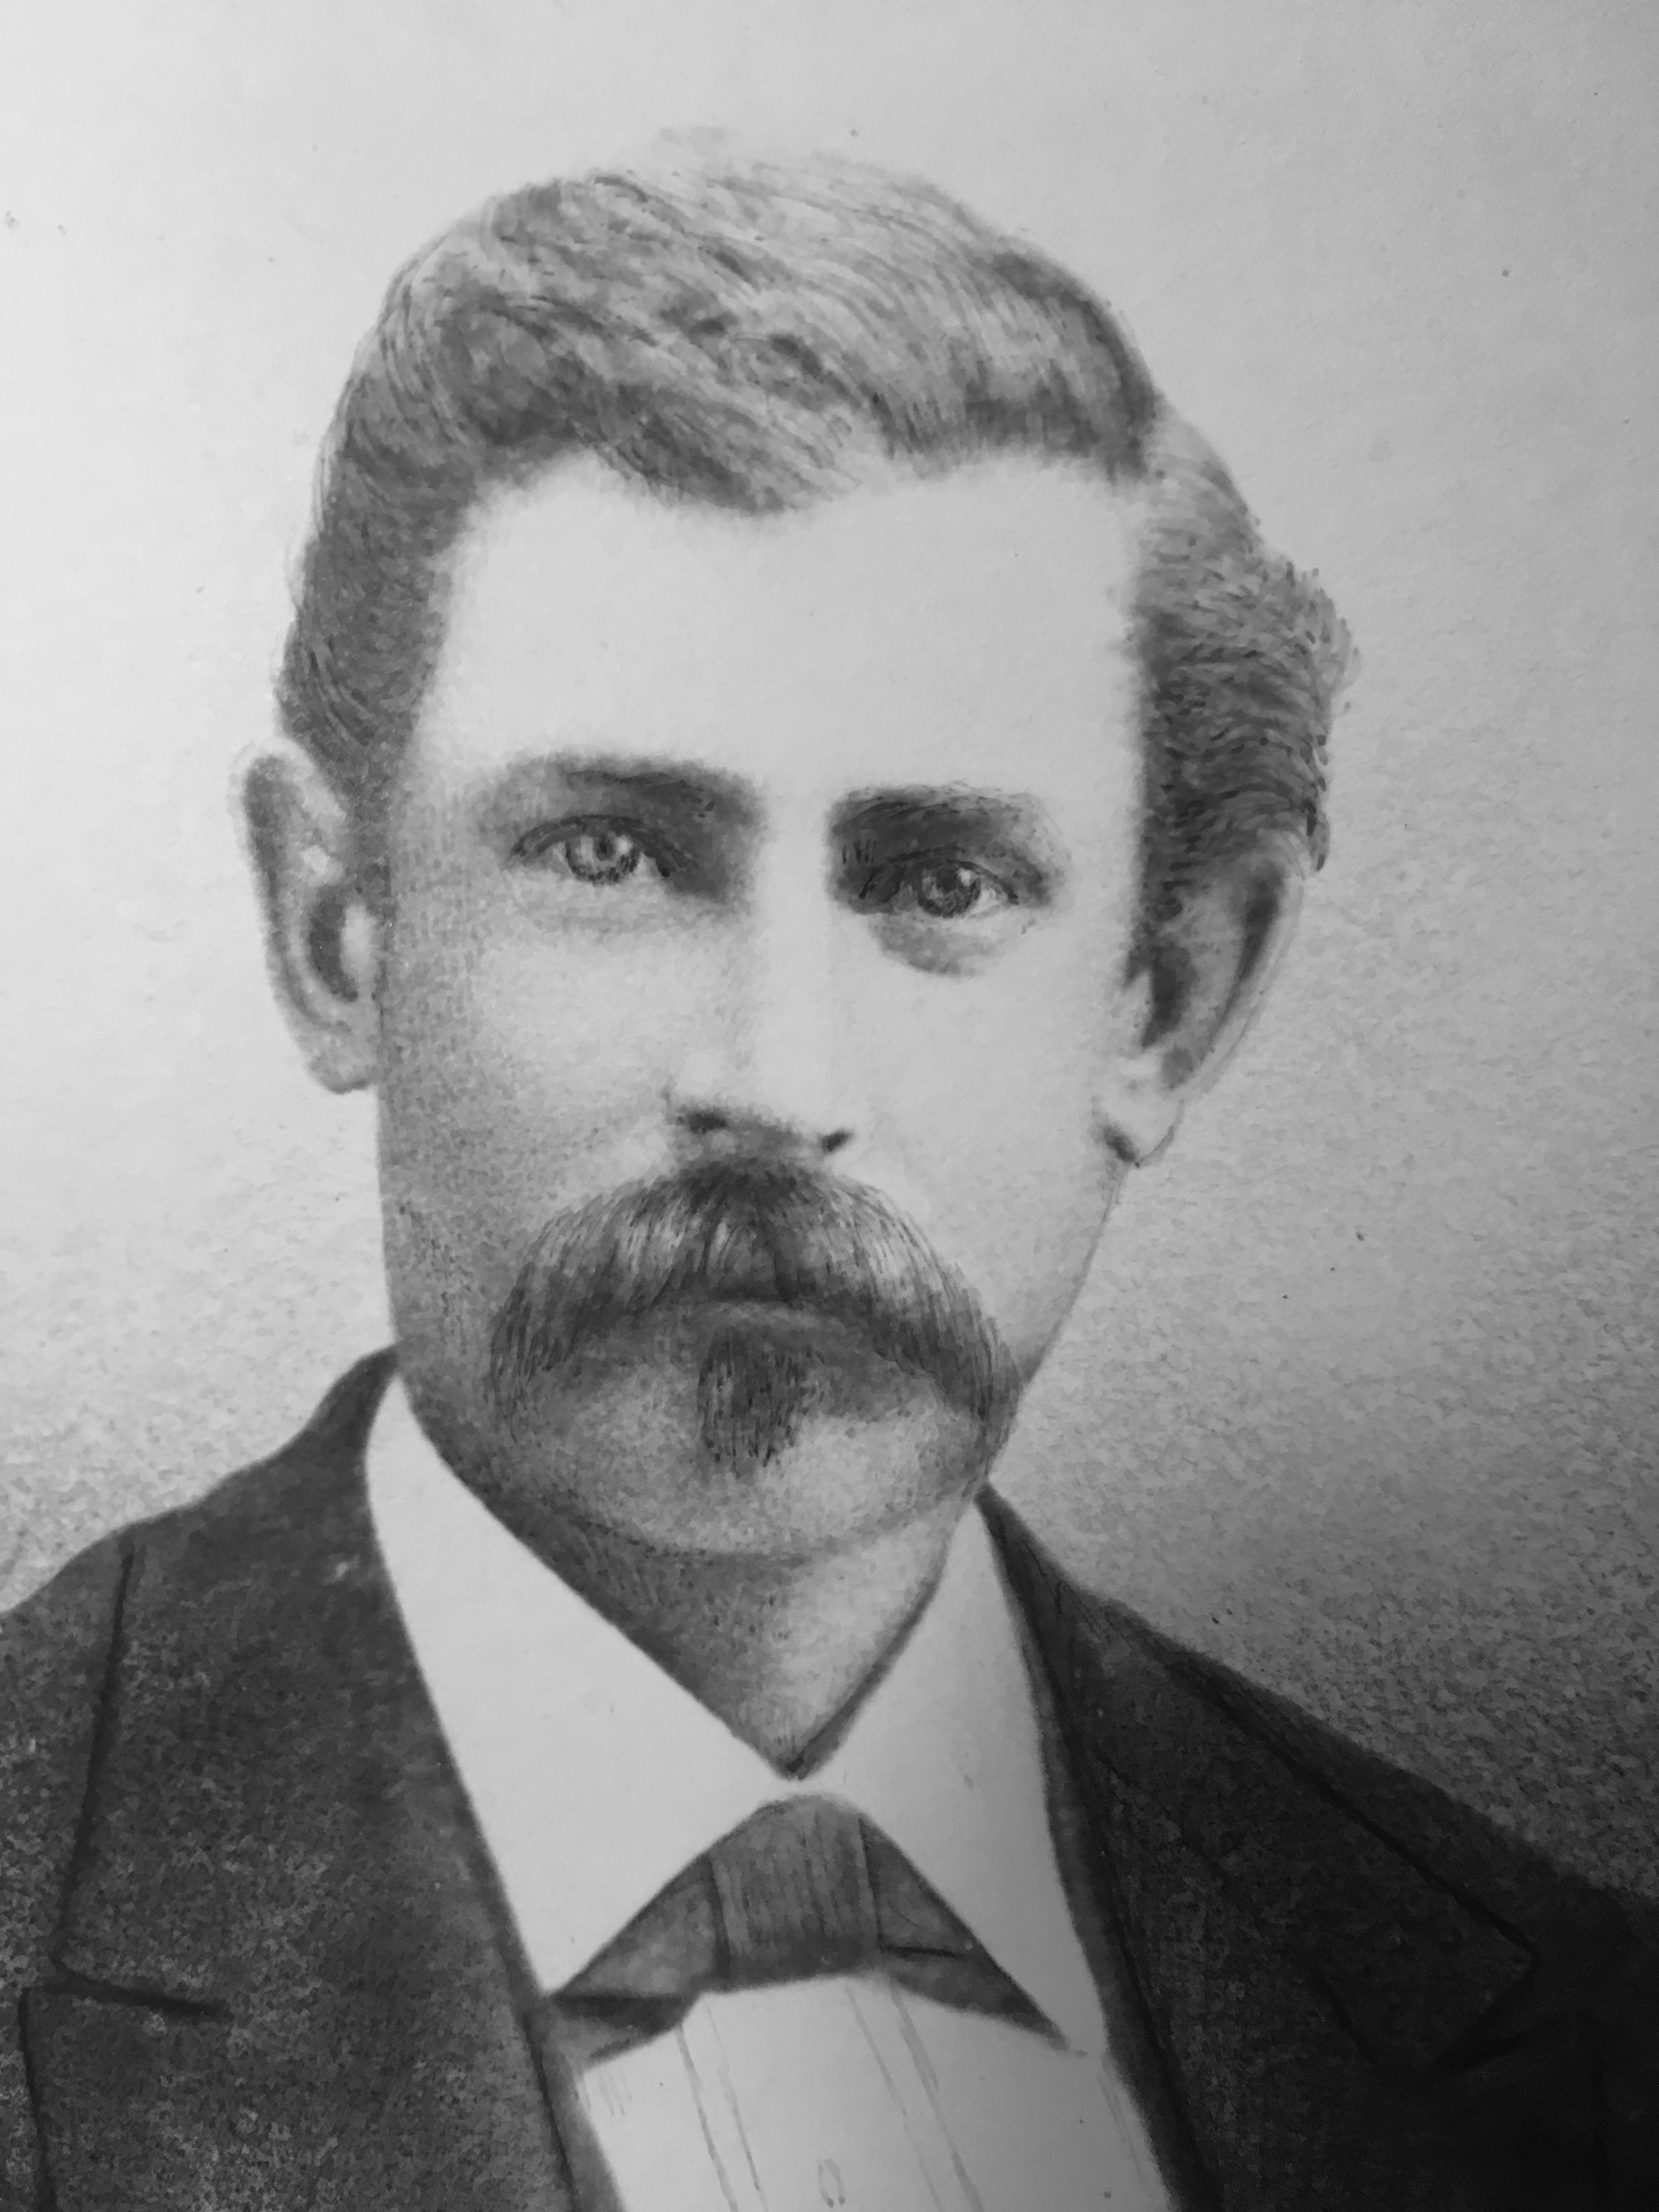 Garn, Philip James, Jr.